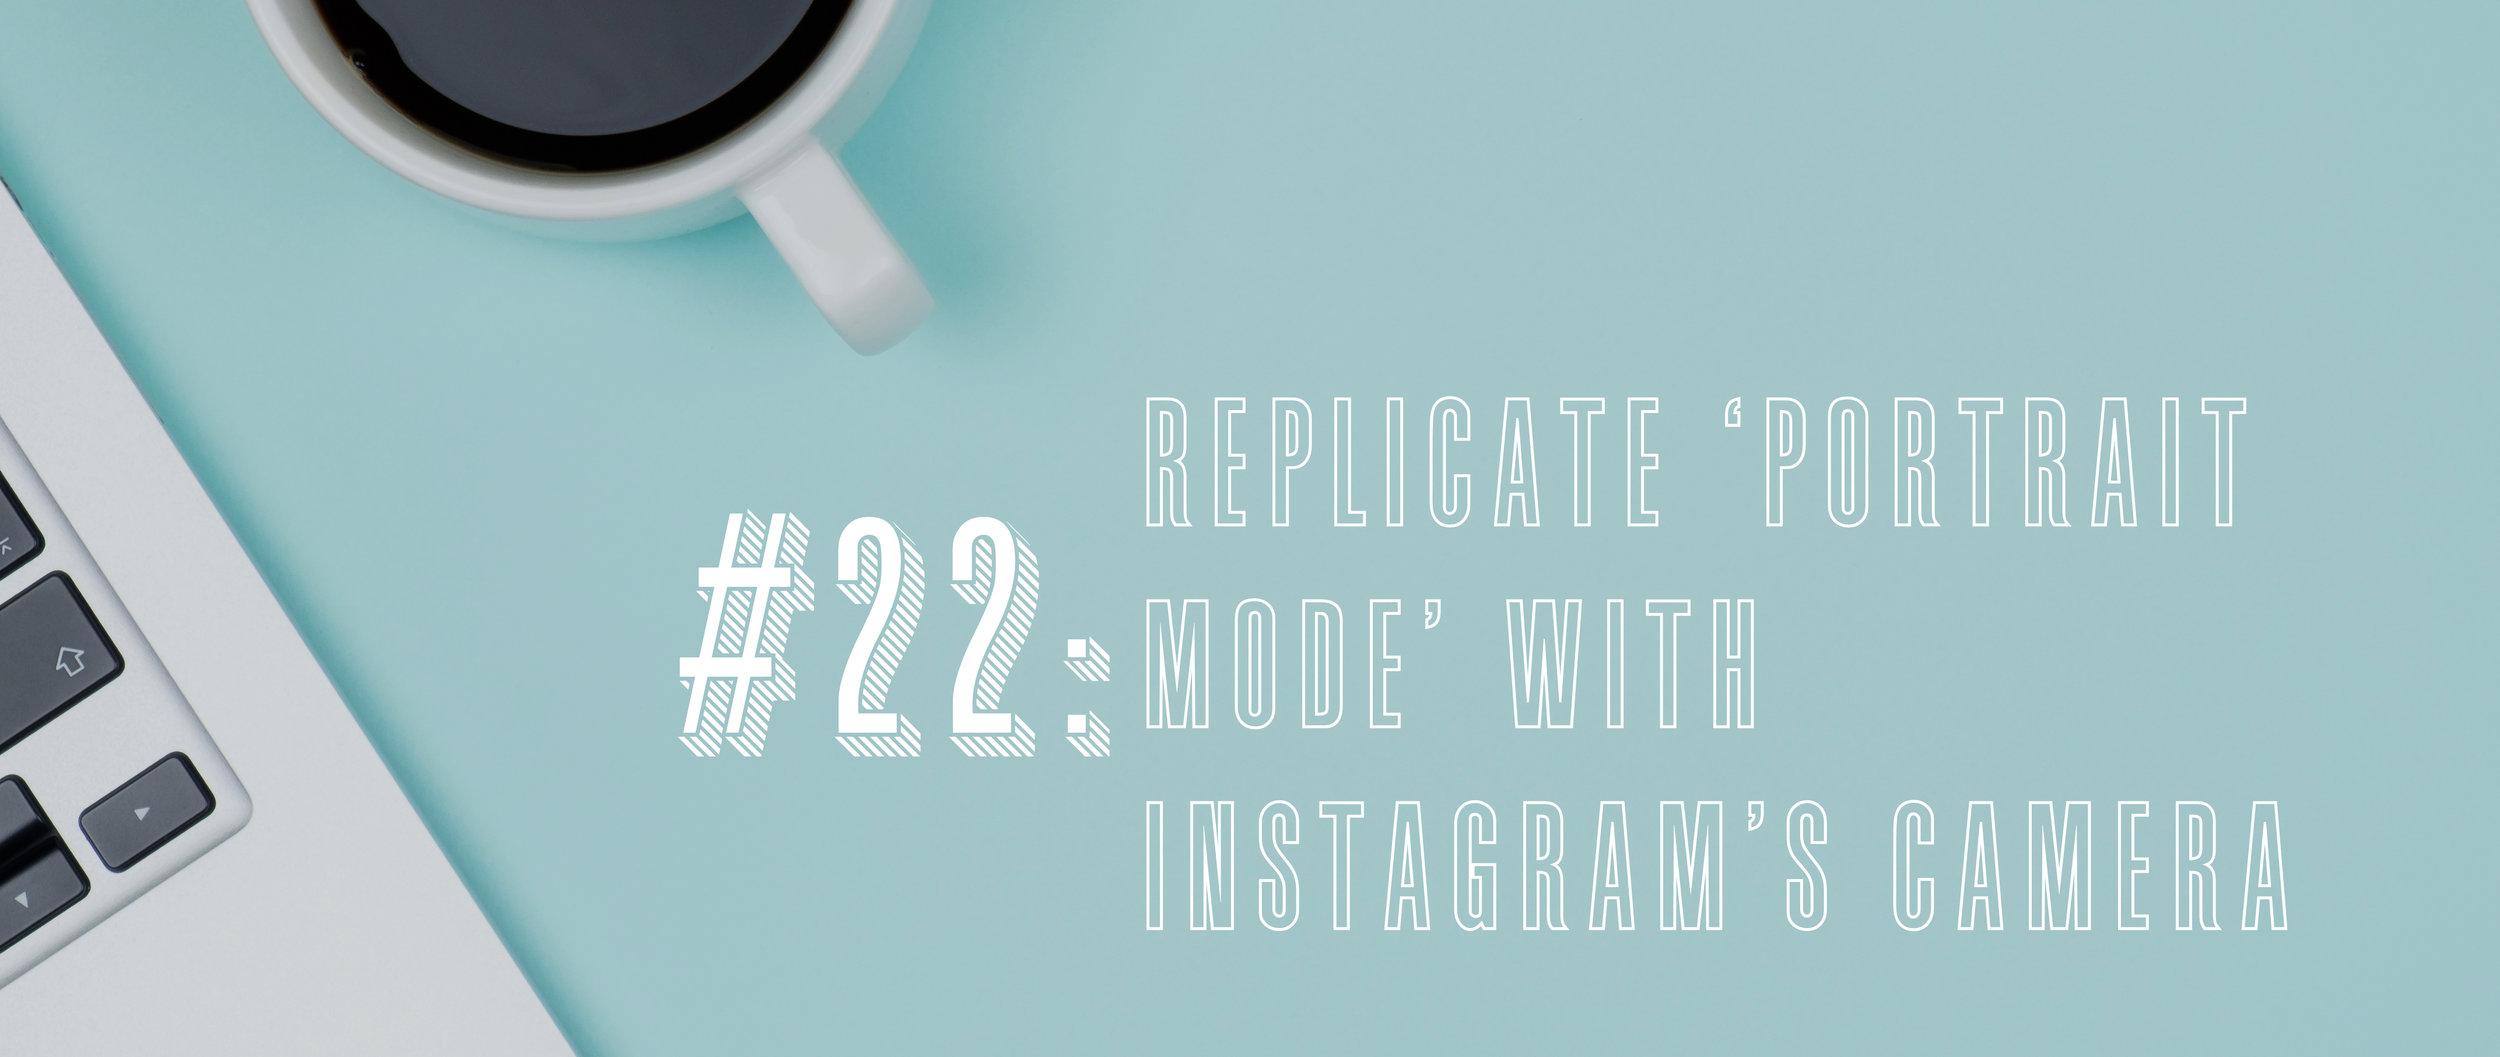 22 Replicate 'Portrait Mode' with Instagram's Camera.jpg